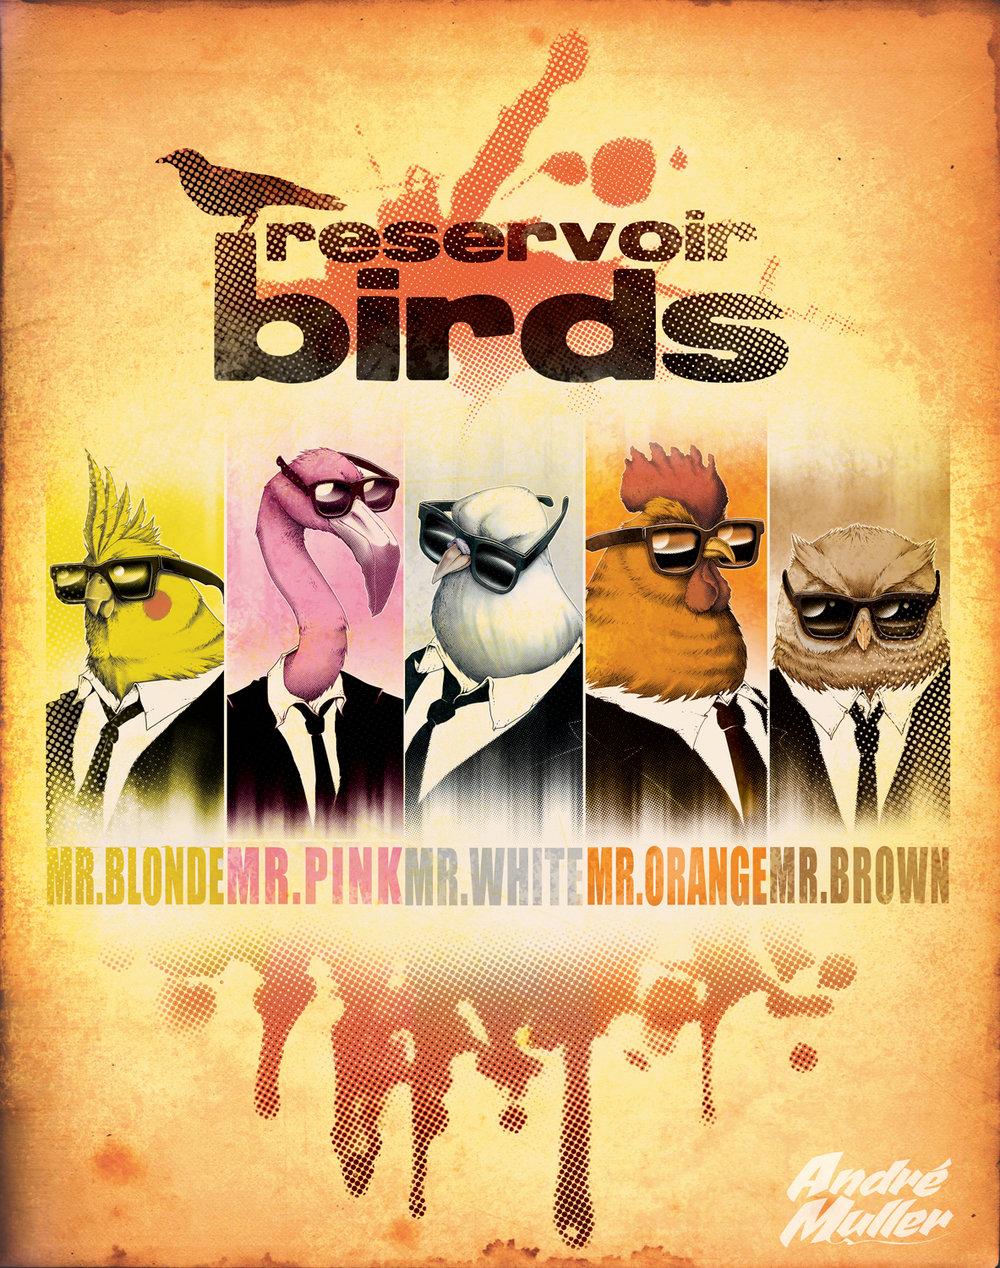 aves de aluguel 1.jpg